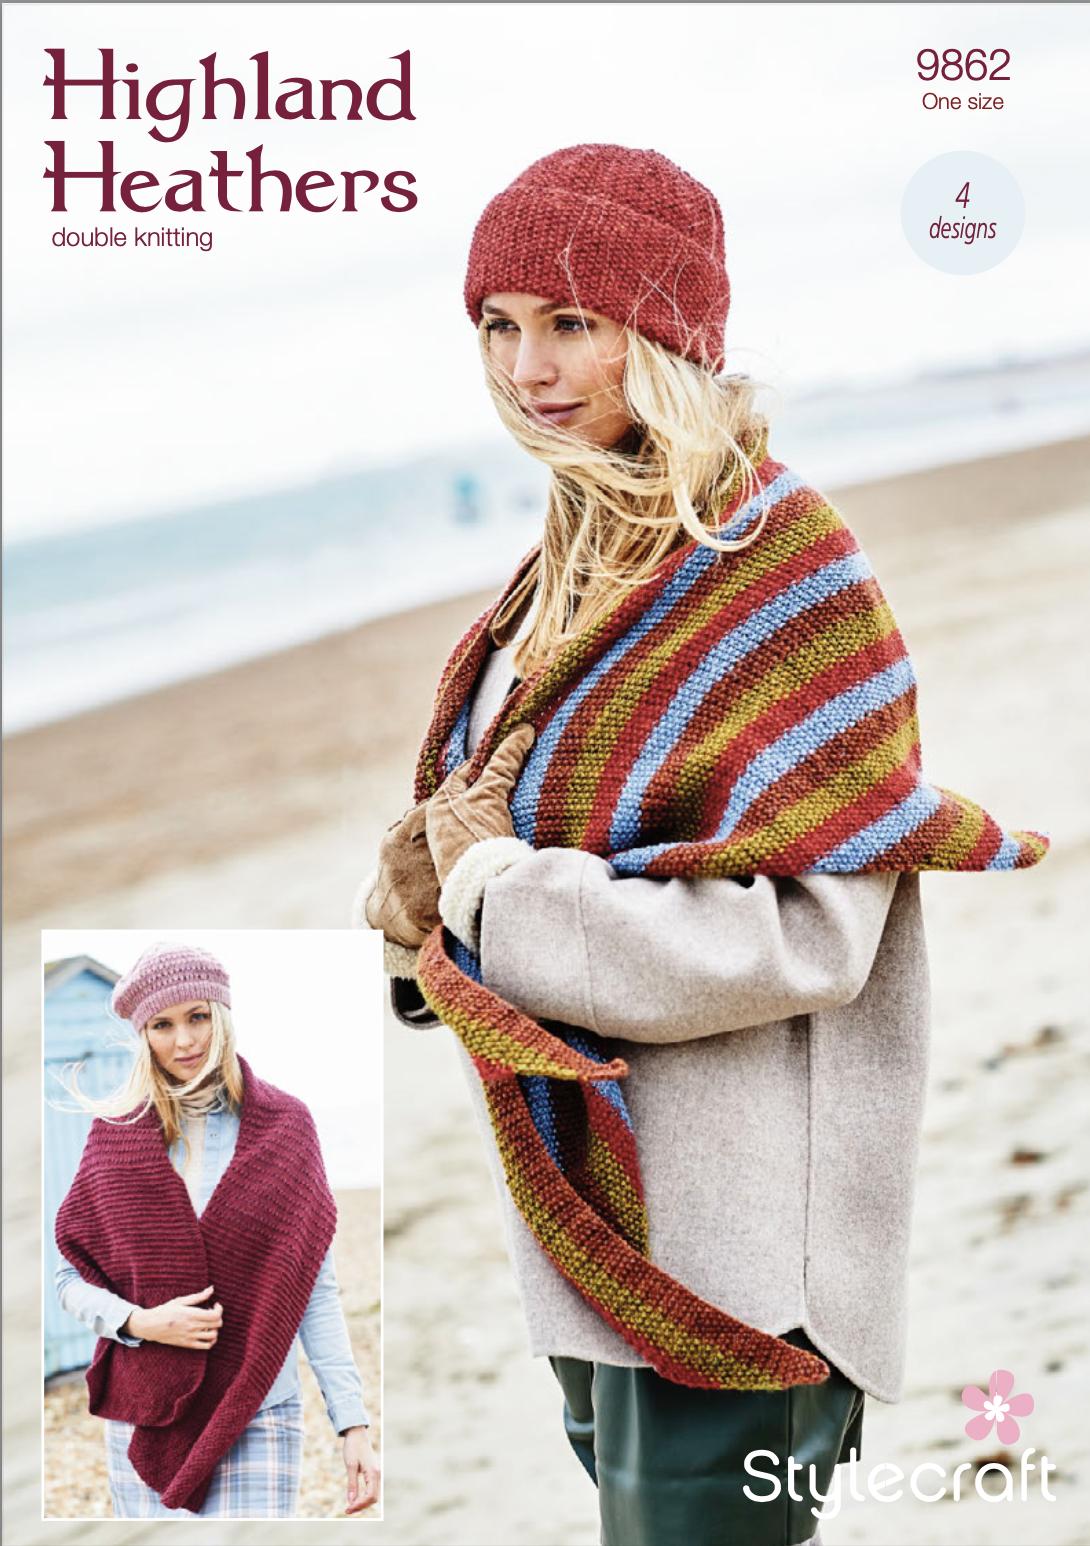 Stylecraft Pattern Highland Heathers 9862 (download) product image